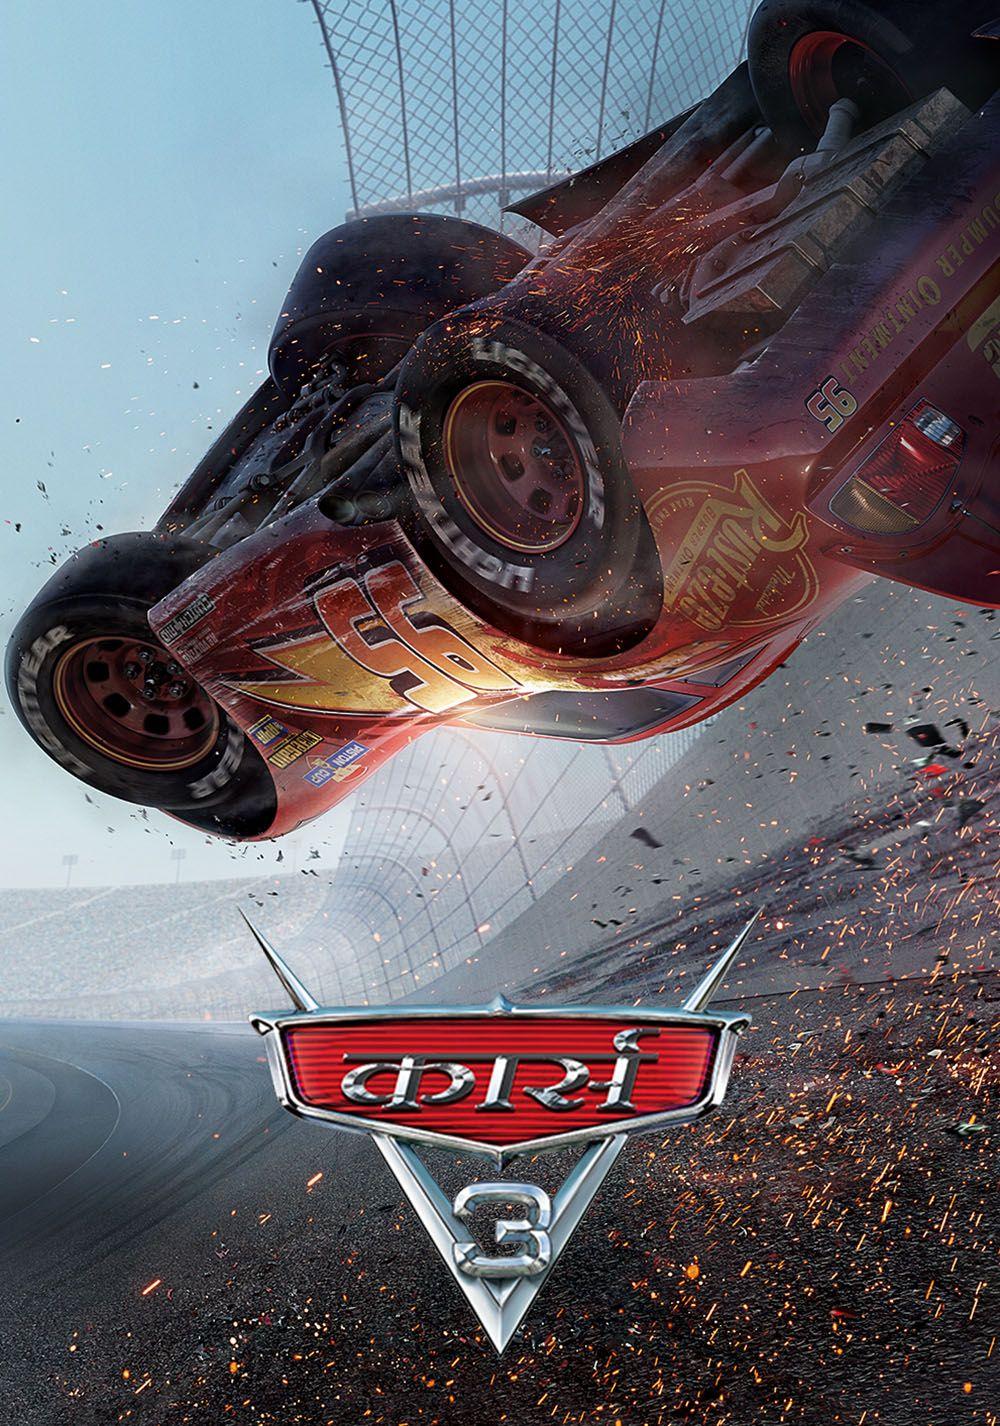 Cars 3 2017 Hindi Poster Cars movie, Fanart tv, Movies